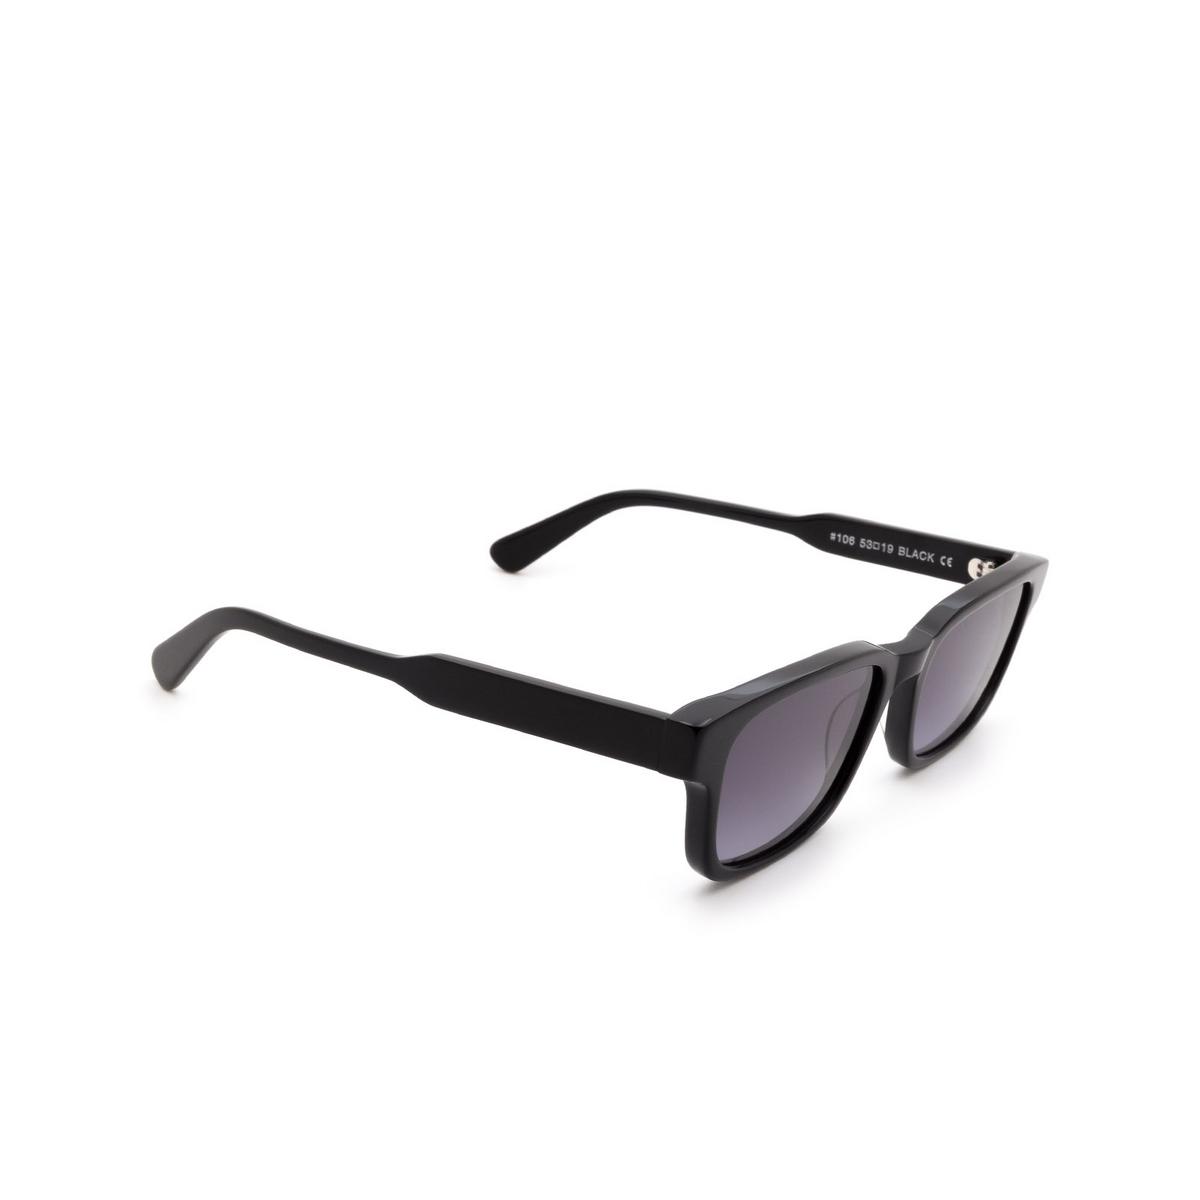 Chimi® Rectangle Sunglasses: #106 color Black - three-quarters view.